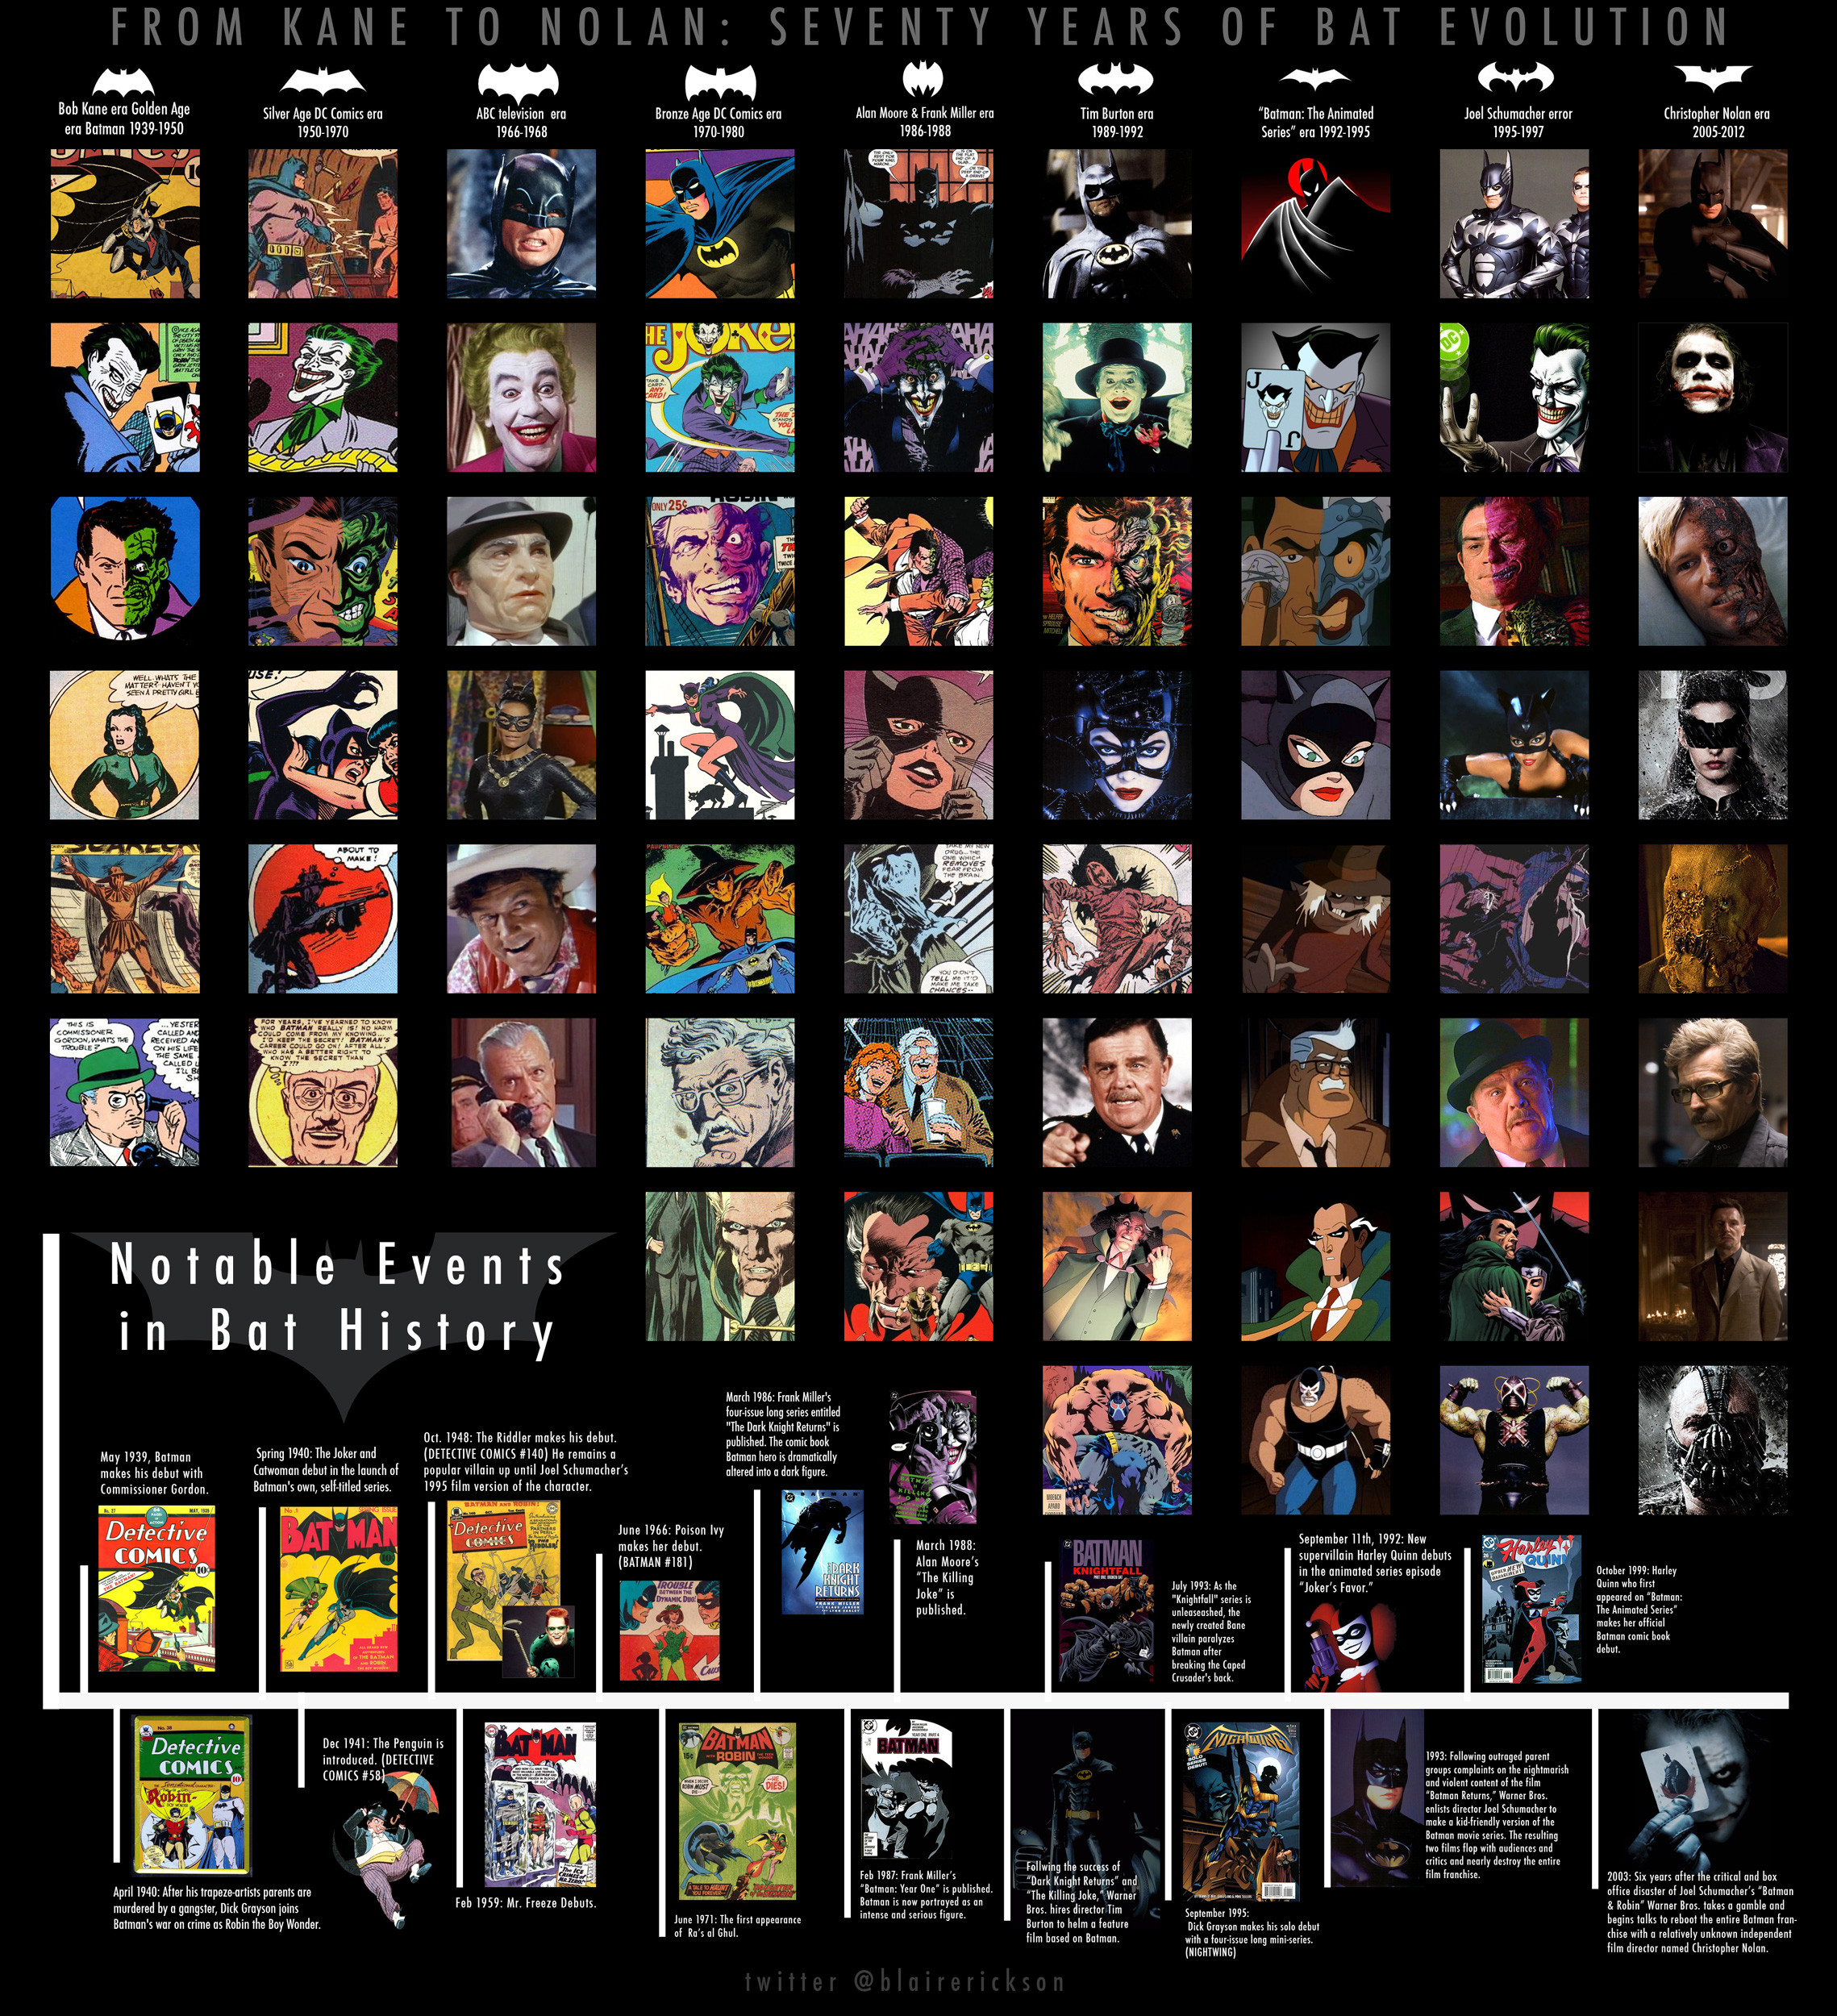 Evolution Of Batman Logocharactersbatmobile Upcoming Vfx Movies